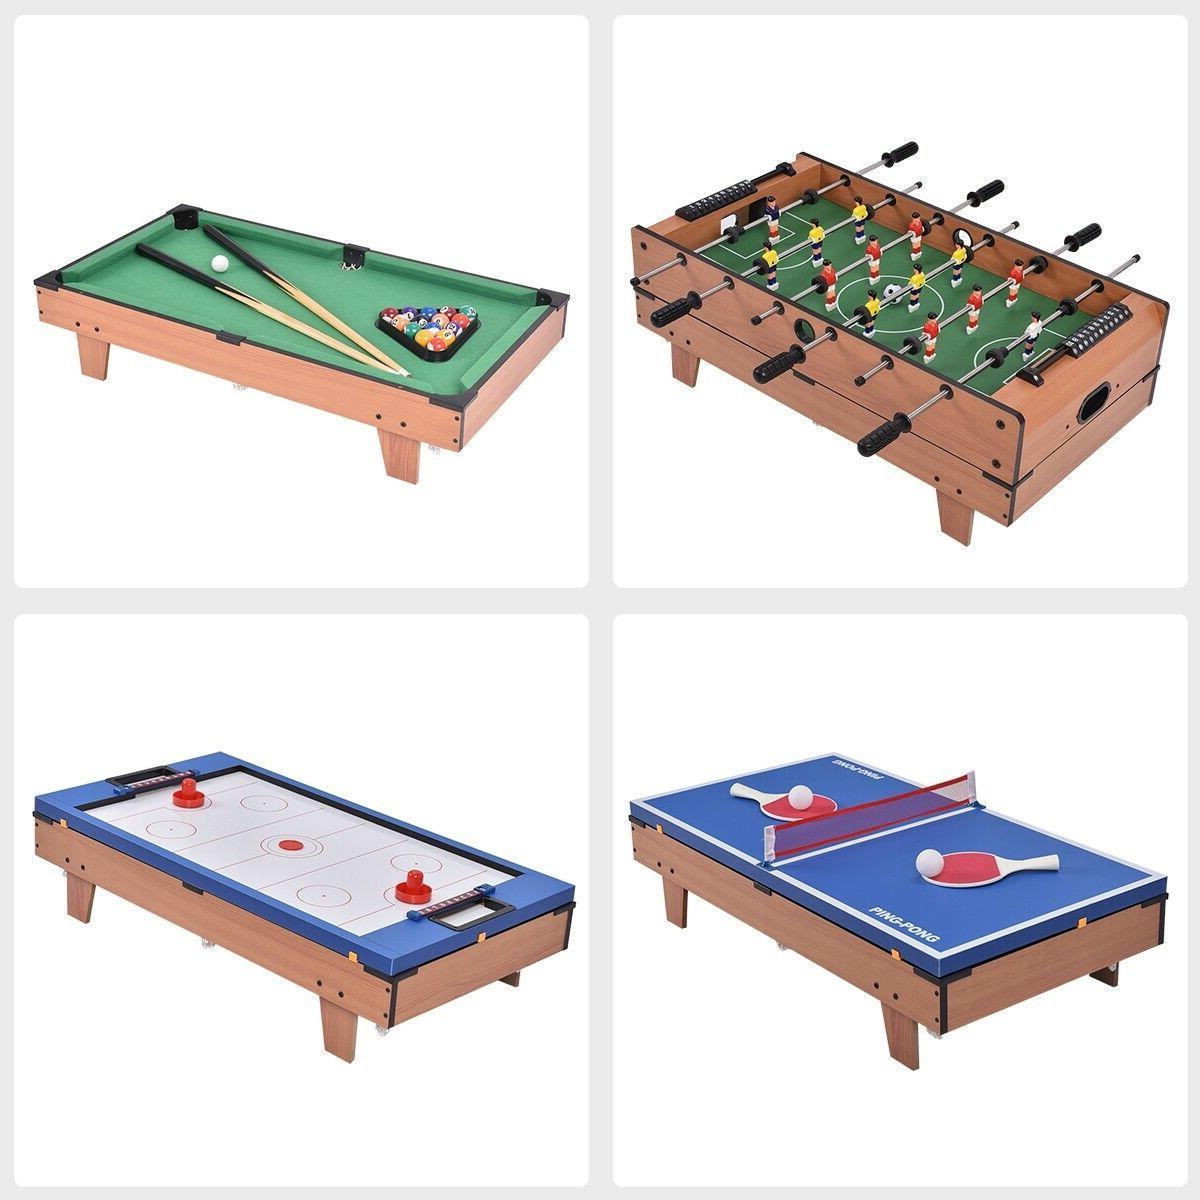 4 Game Table Billiards/Pool, Foosball, Hockey, Tennis